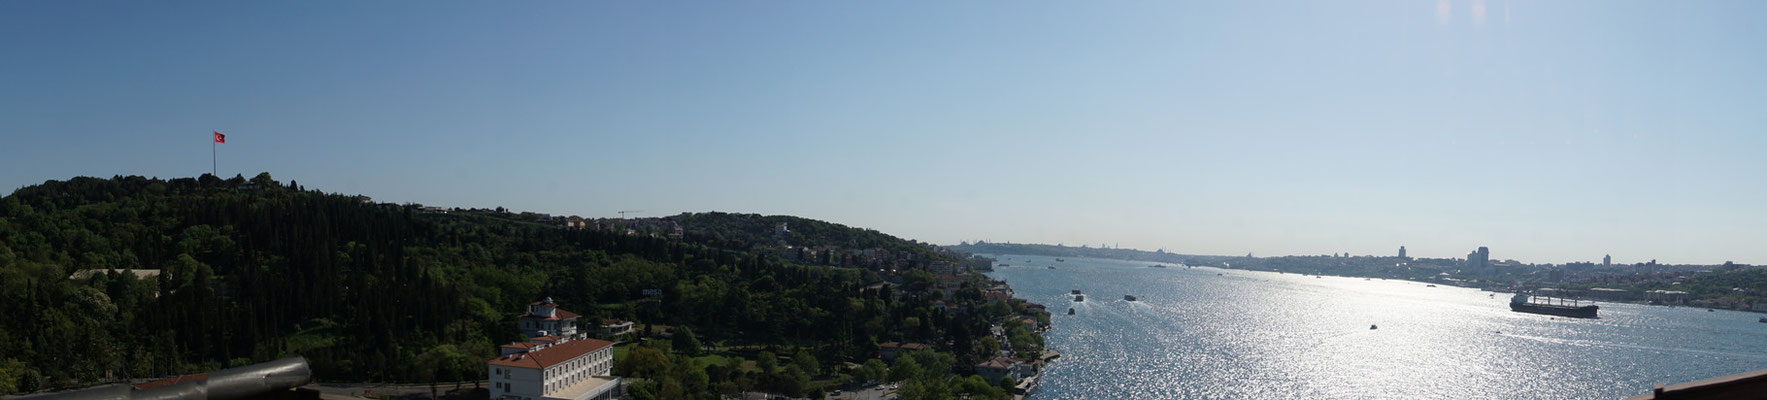 Panaroma des Bosphorus... - links Asien - rechts Europa...